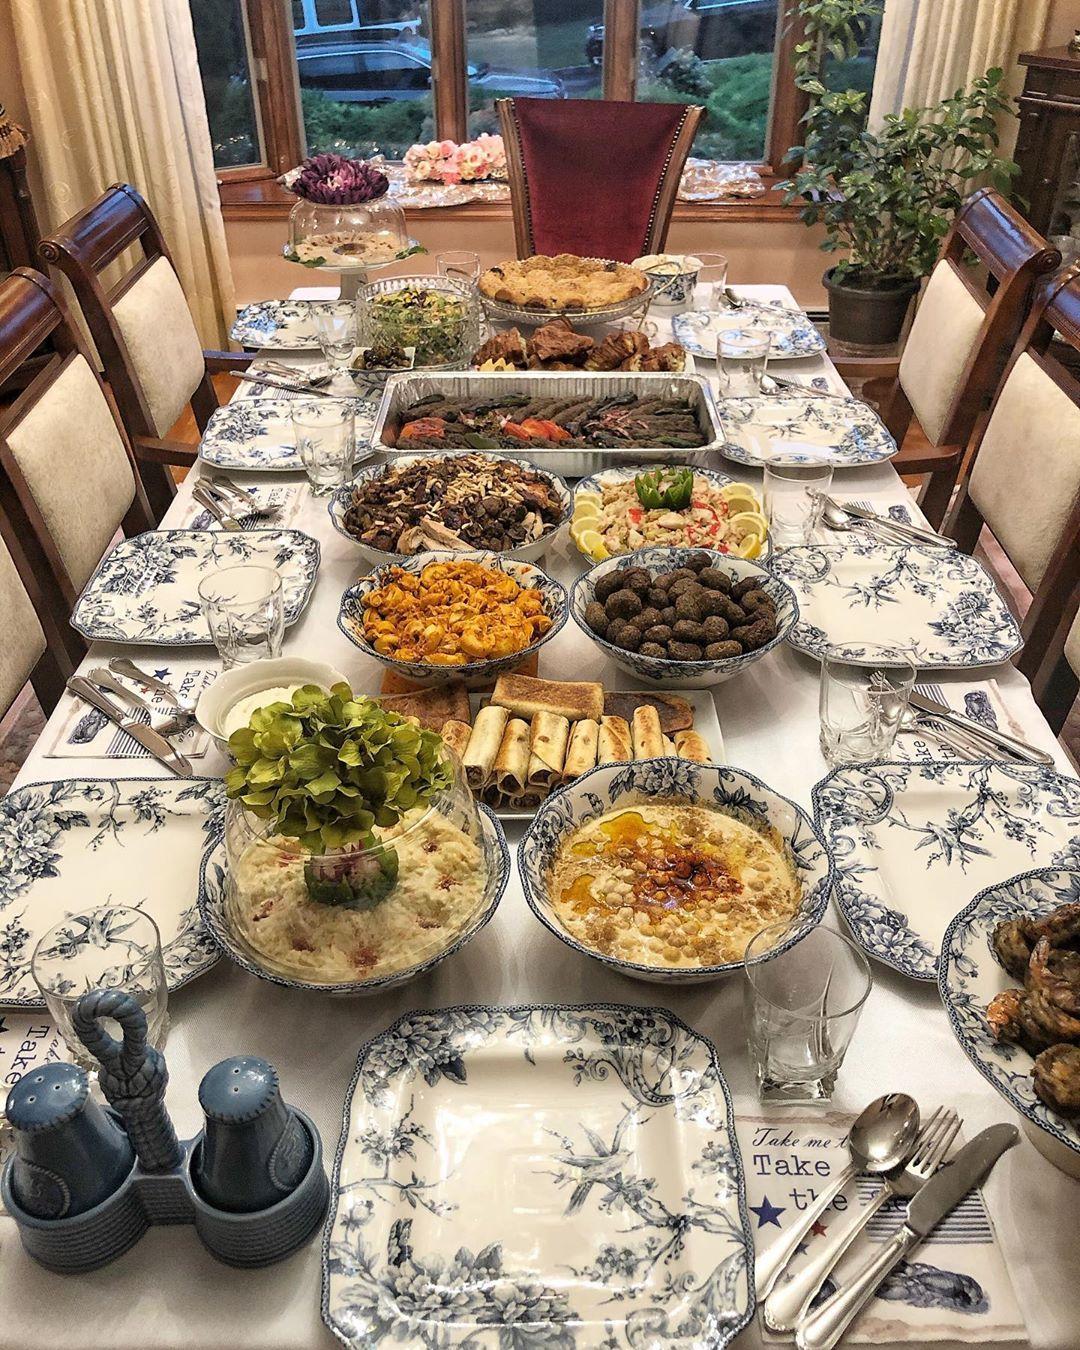 Mays S Creations For Home On Instagram احبائي و عائلتي بتشكركم لوجودكم بحياتي و لدعمكم و محبتكم مستمتعه برسائلكم اللطيفه جدا و Middle Eastern Cuisine